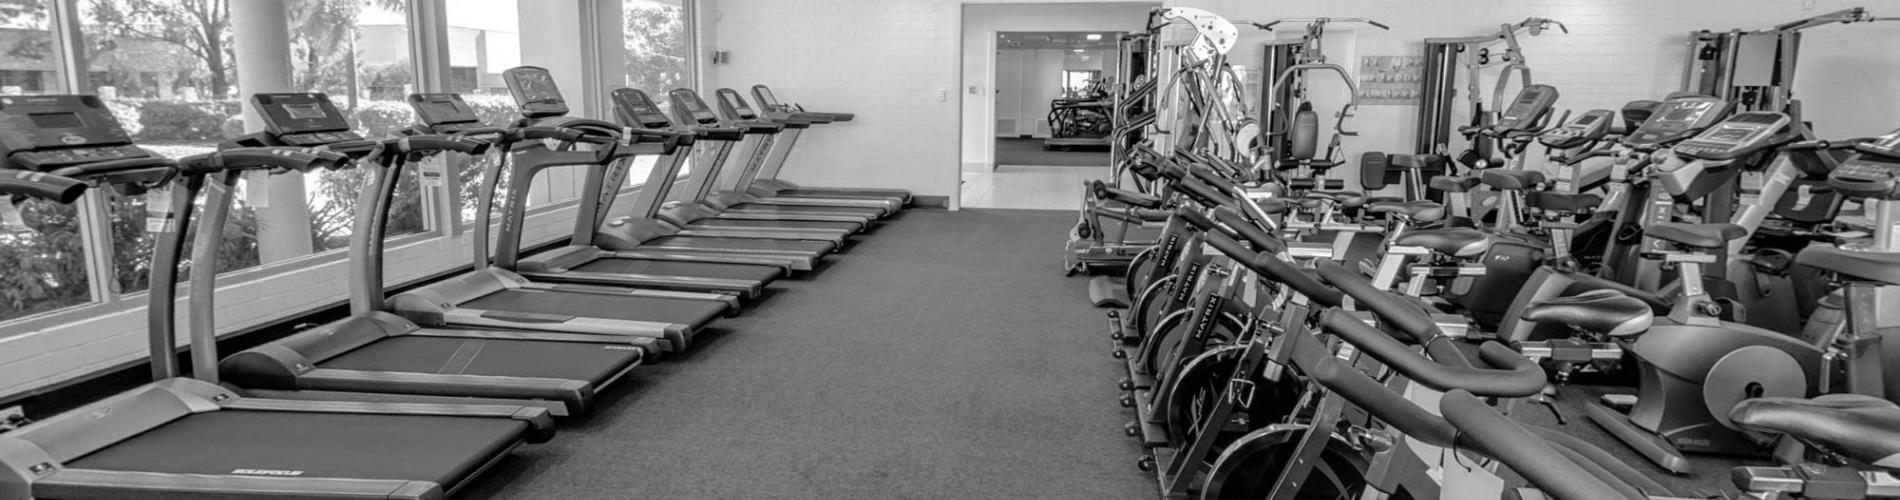 Fitness equipment hire sales fleet fitness perth